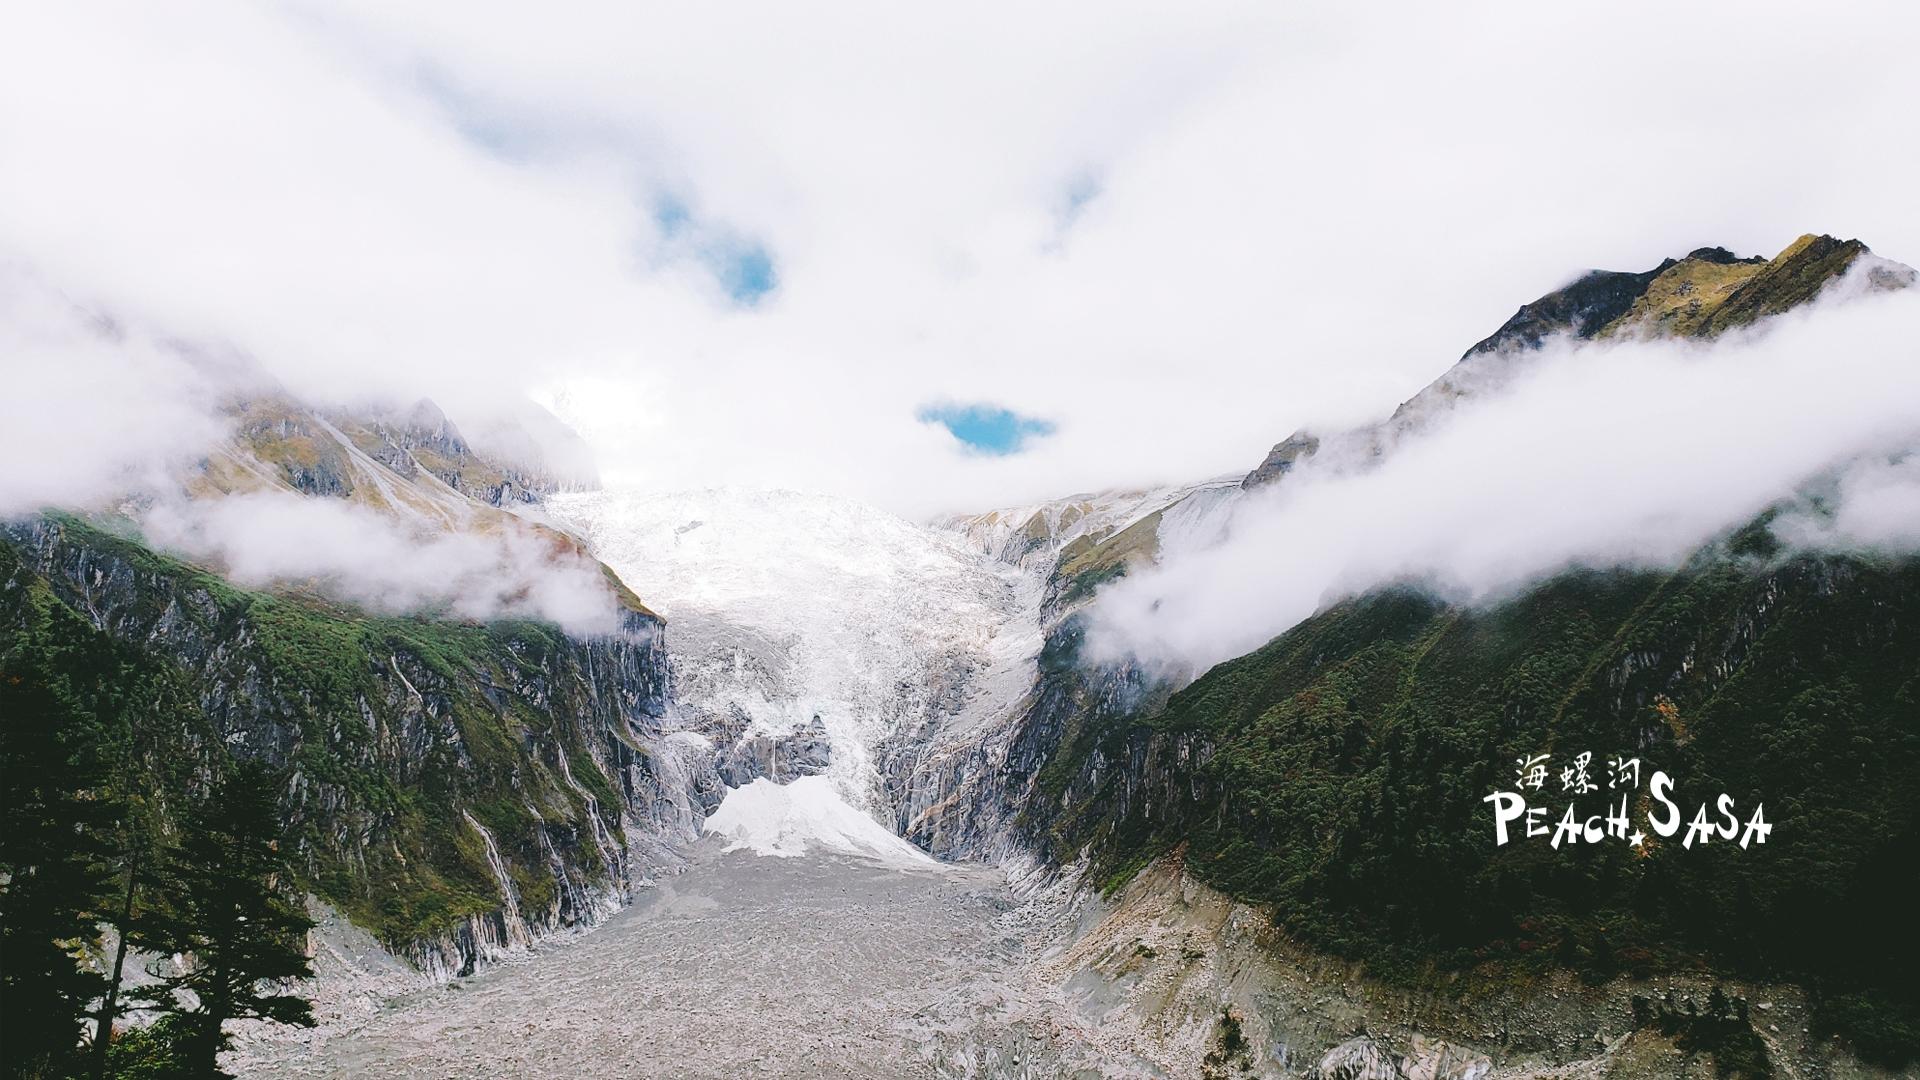 SiChuan HaiLuoGou Glacier Park